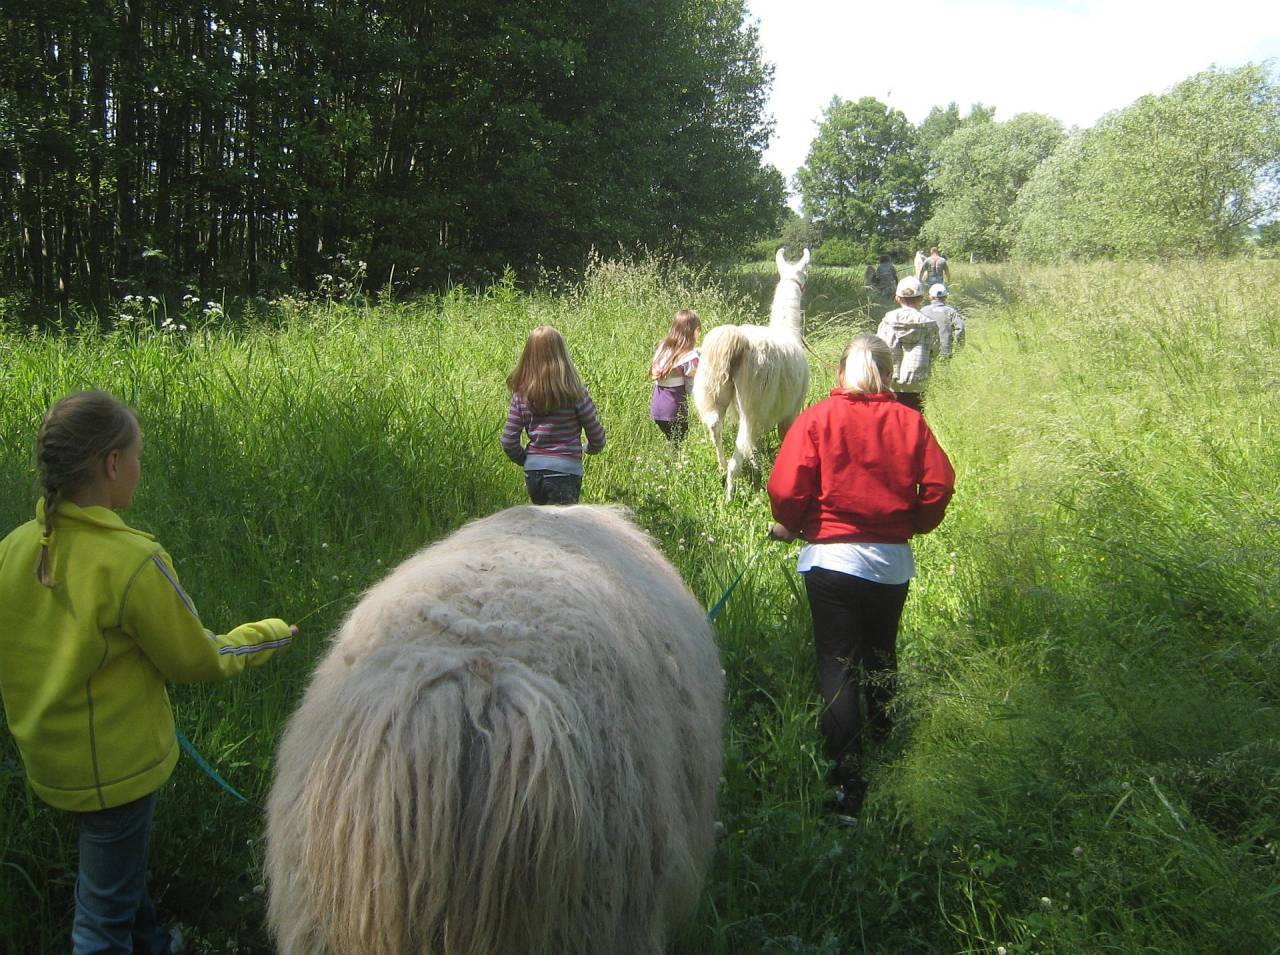 lama thüringen lamawanderung familienausflug tiergestützte therapie